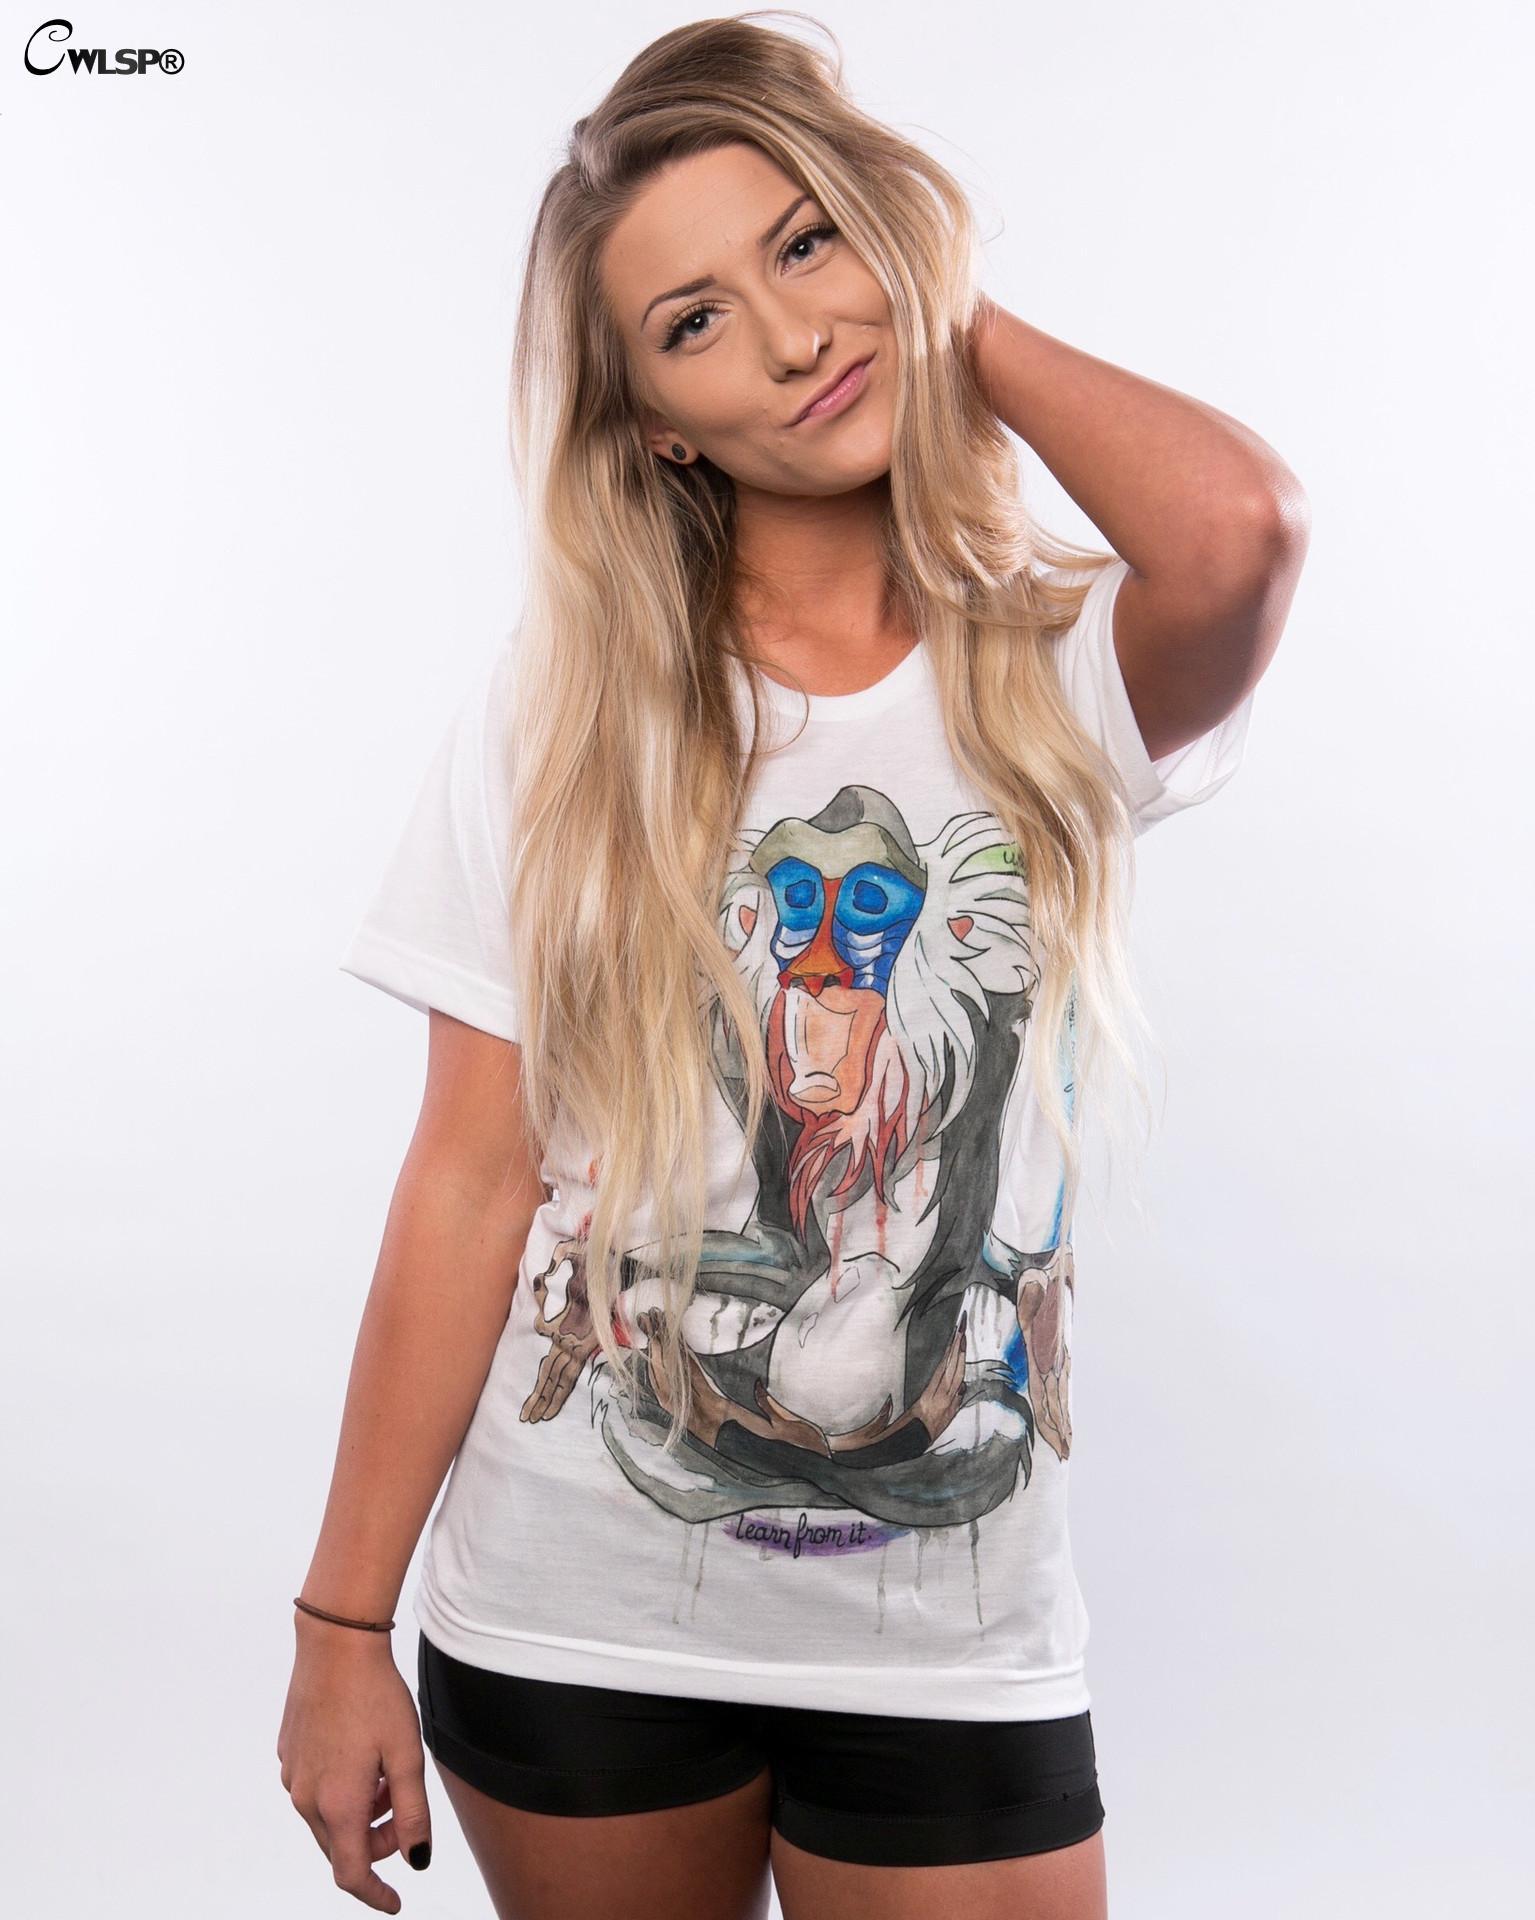 HTB1Ze7gKXXXXXaZXFXXq6xXFXXXU - Summer Colorful Printed T shirt Women Fashion Letter Short Sleeve